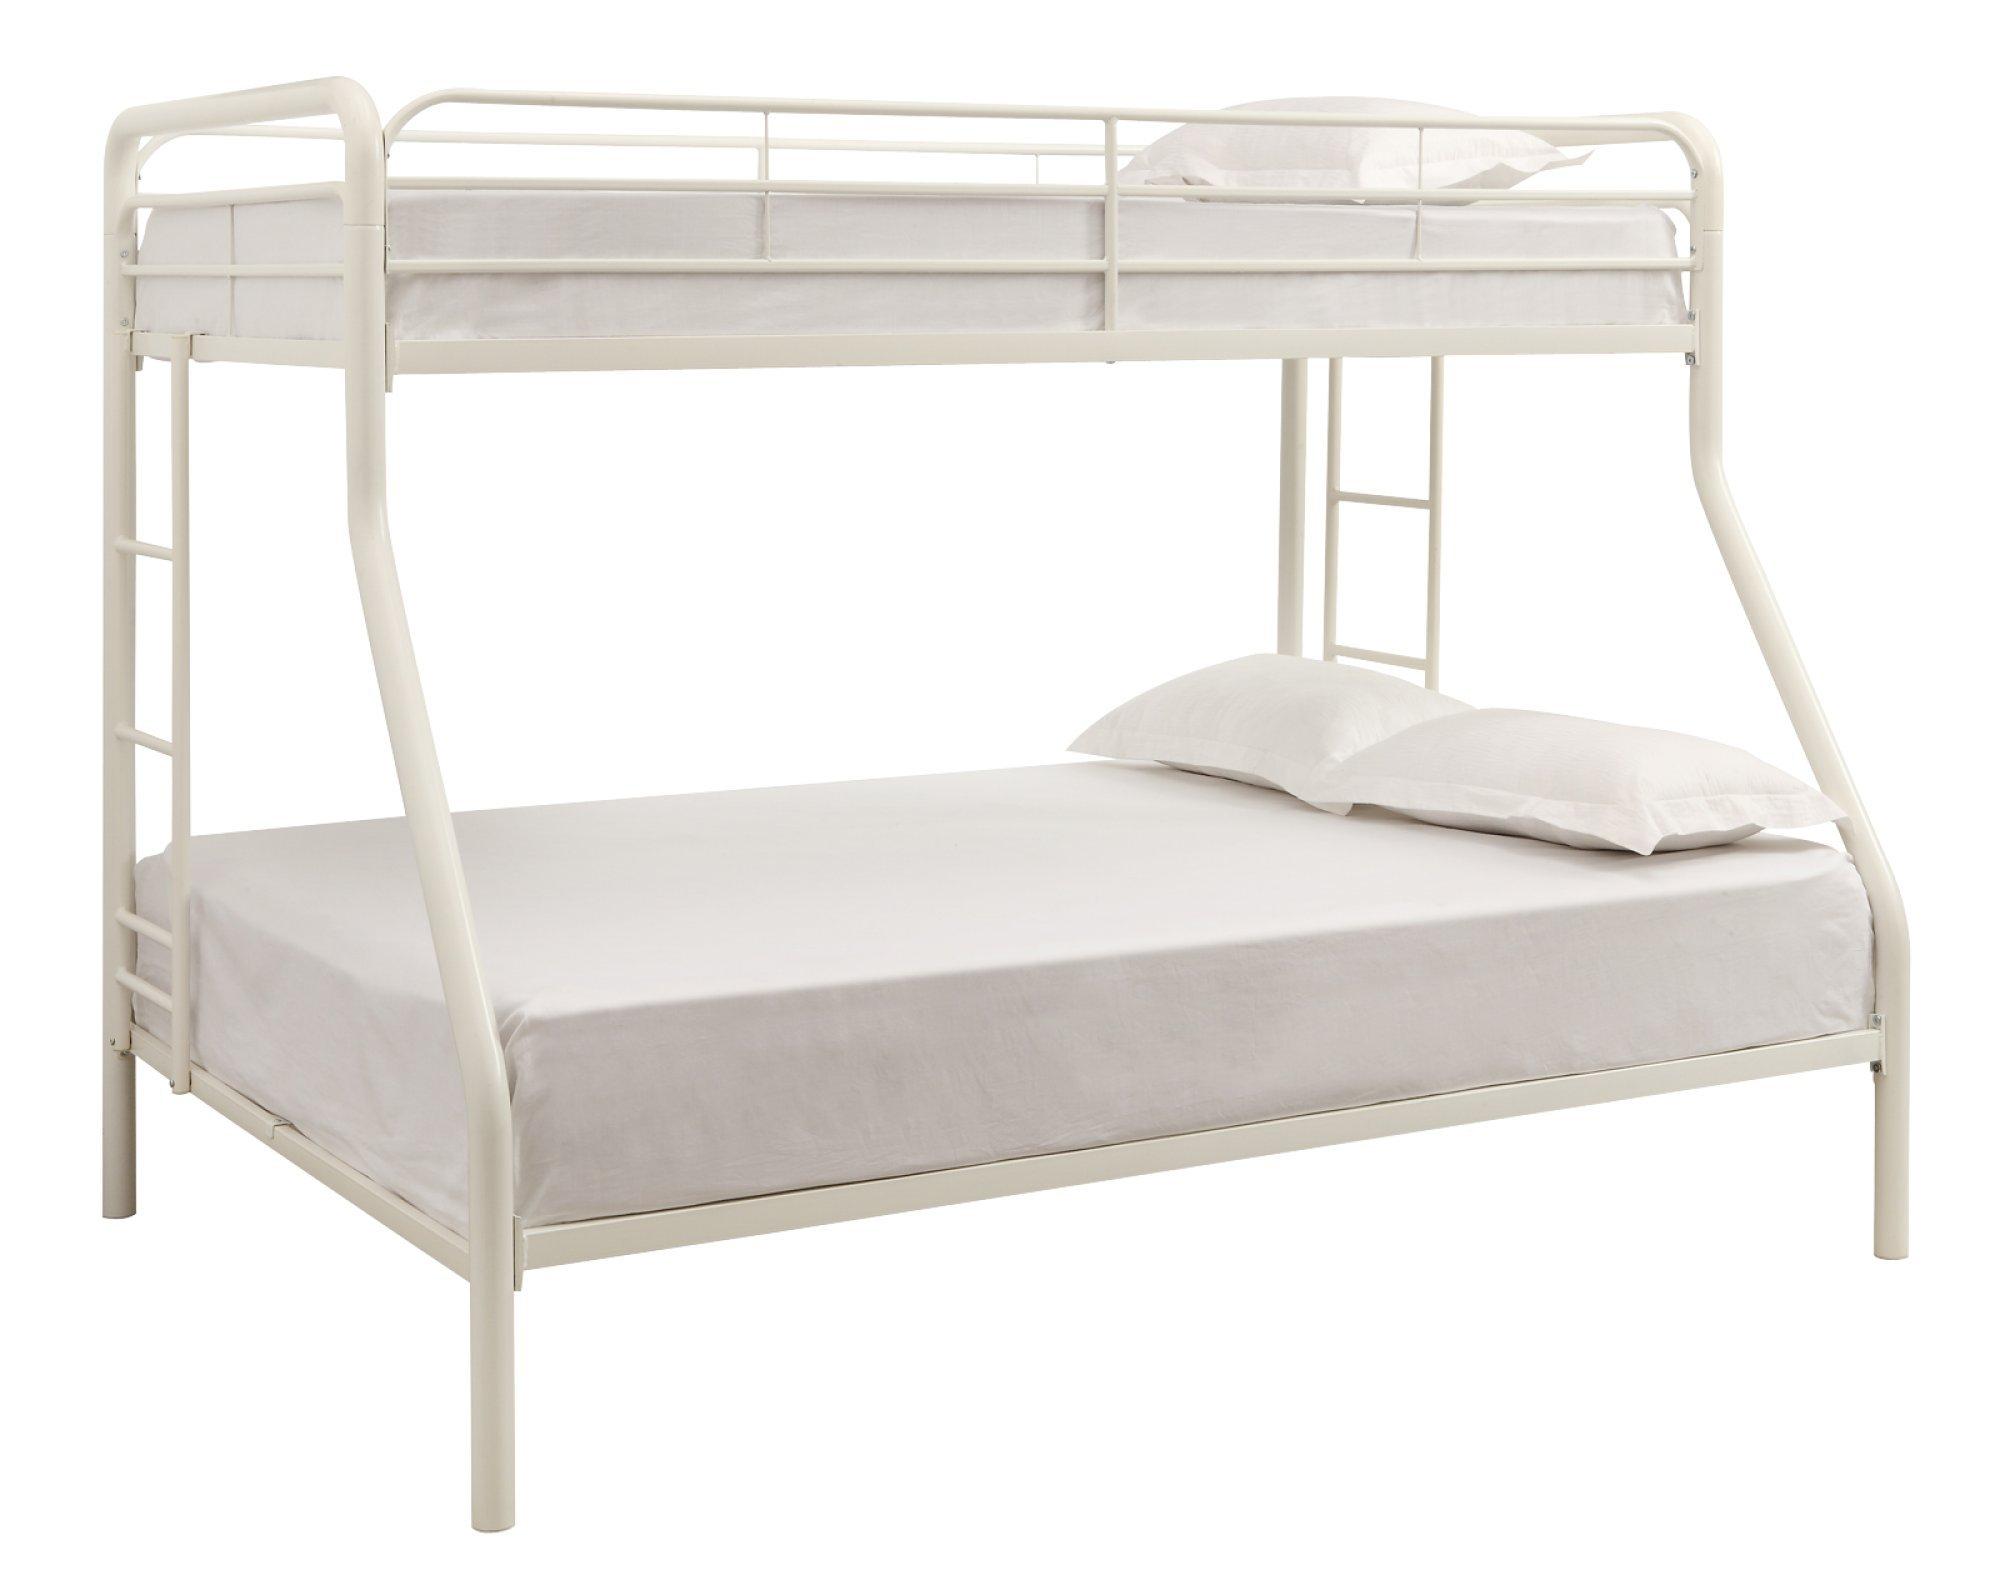 queen loft beds. Black Bedroom Furniture Sets. Home Design Ideas